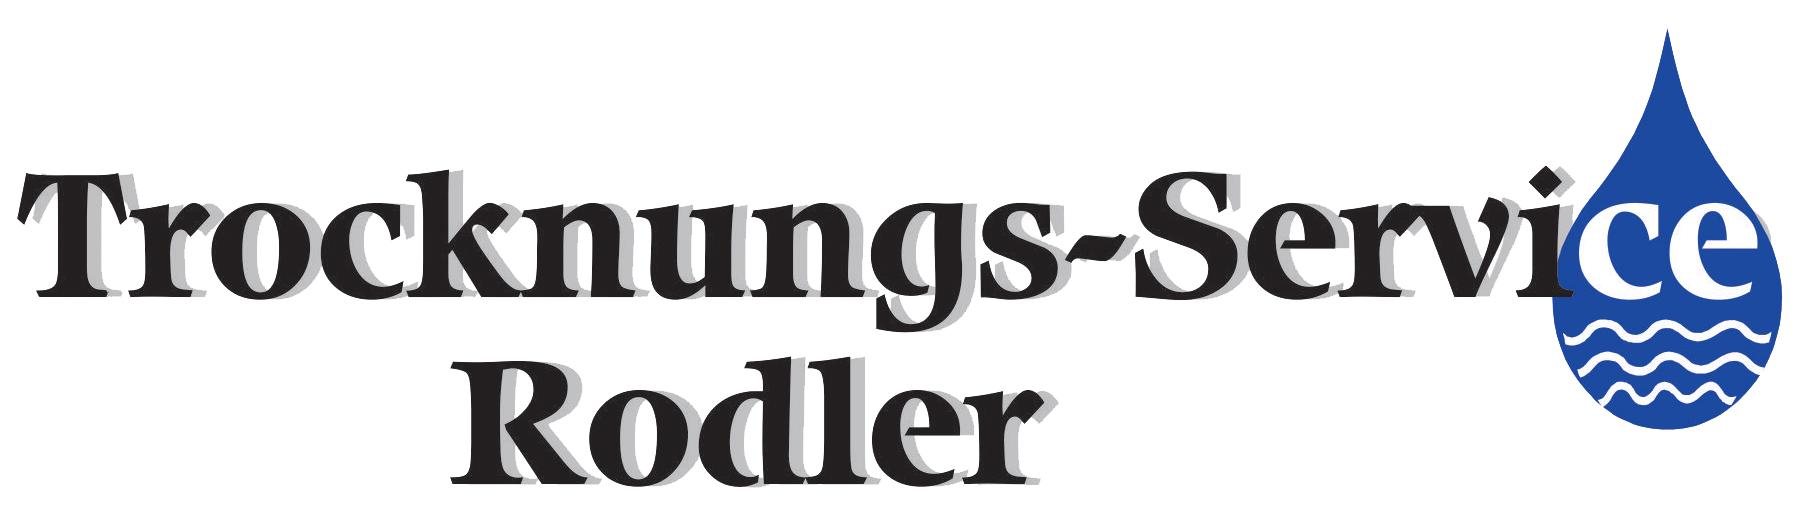 Trocknungsservice Rodler